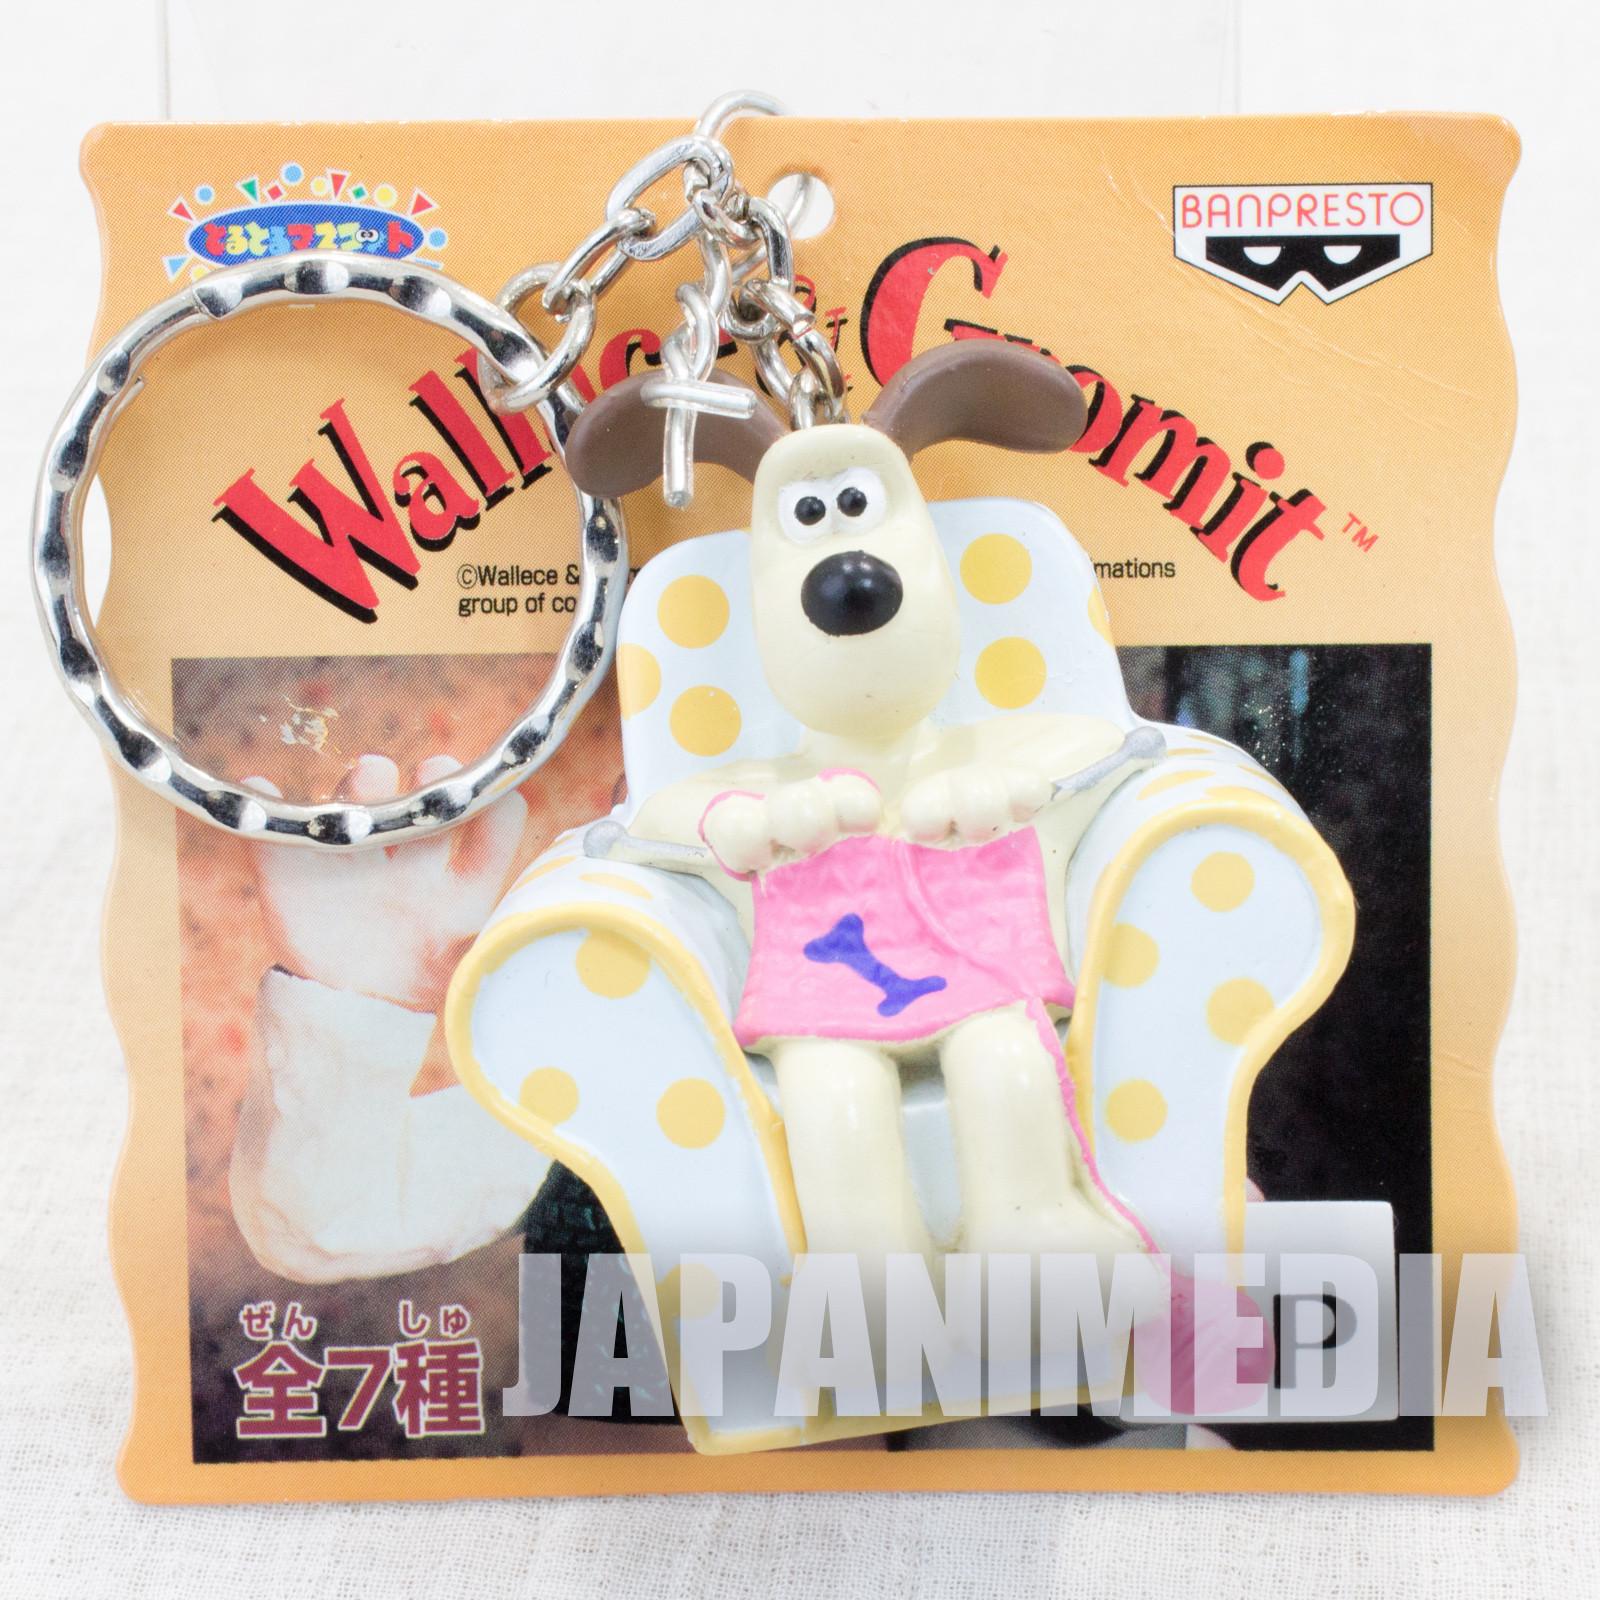 Wallace & Gromit Knitting on Sofa Figure Key Chain Banpresto JAPAN Ardman ANIME